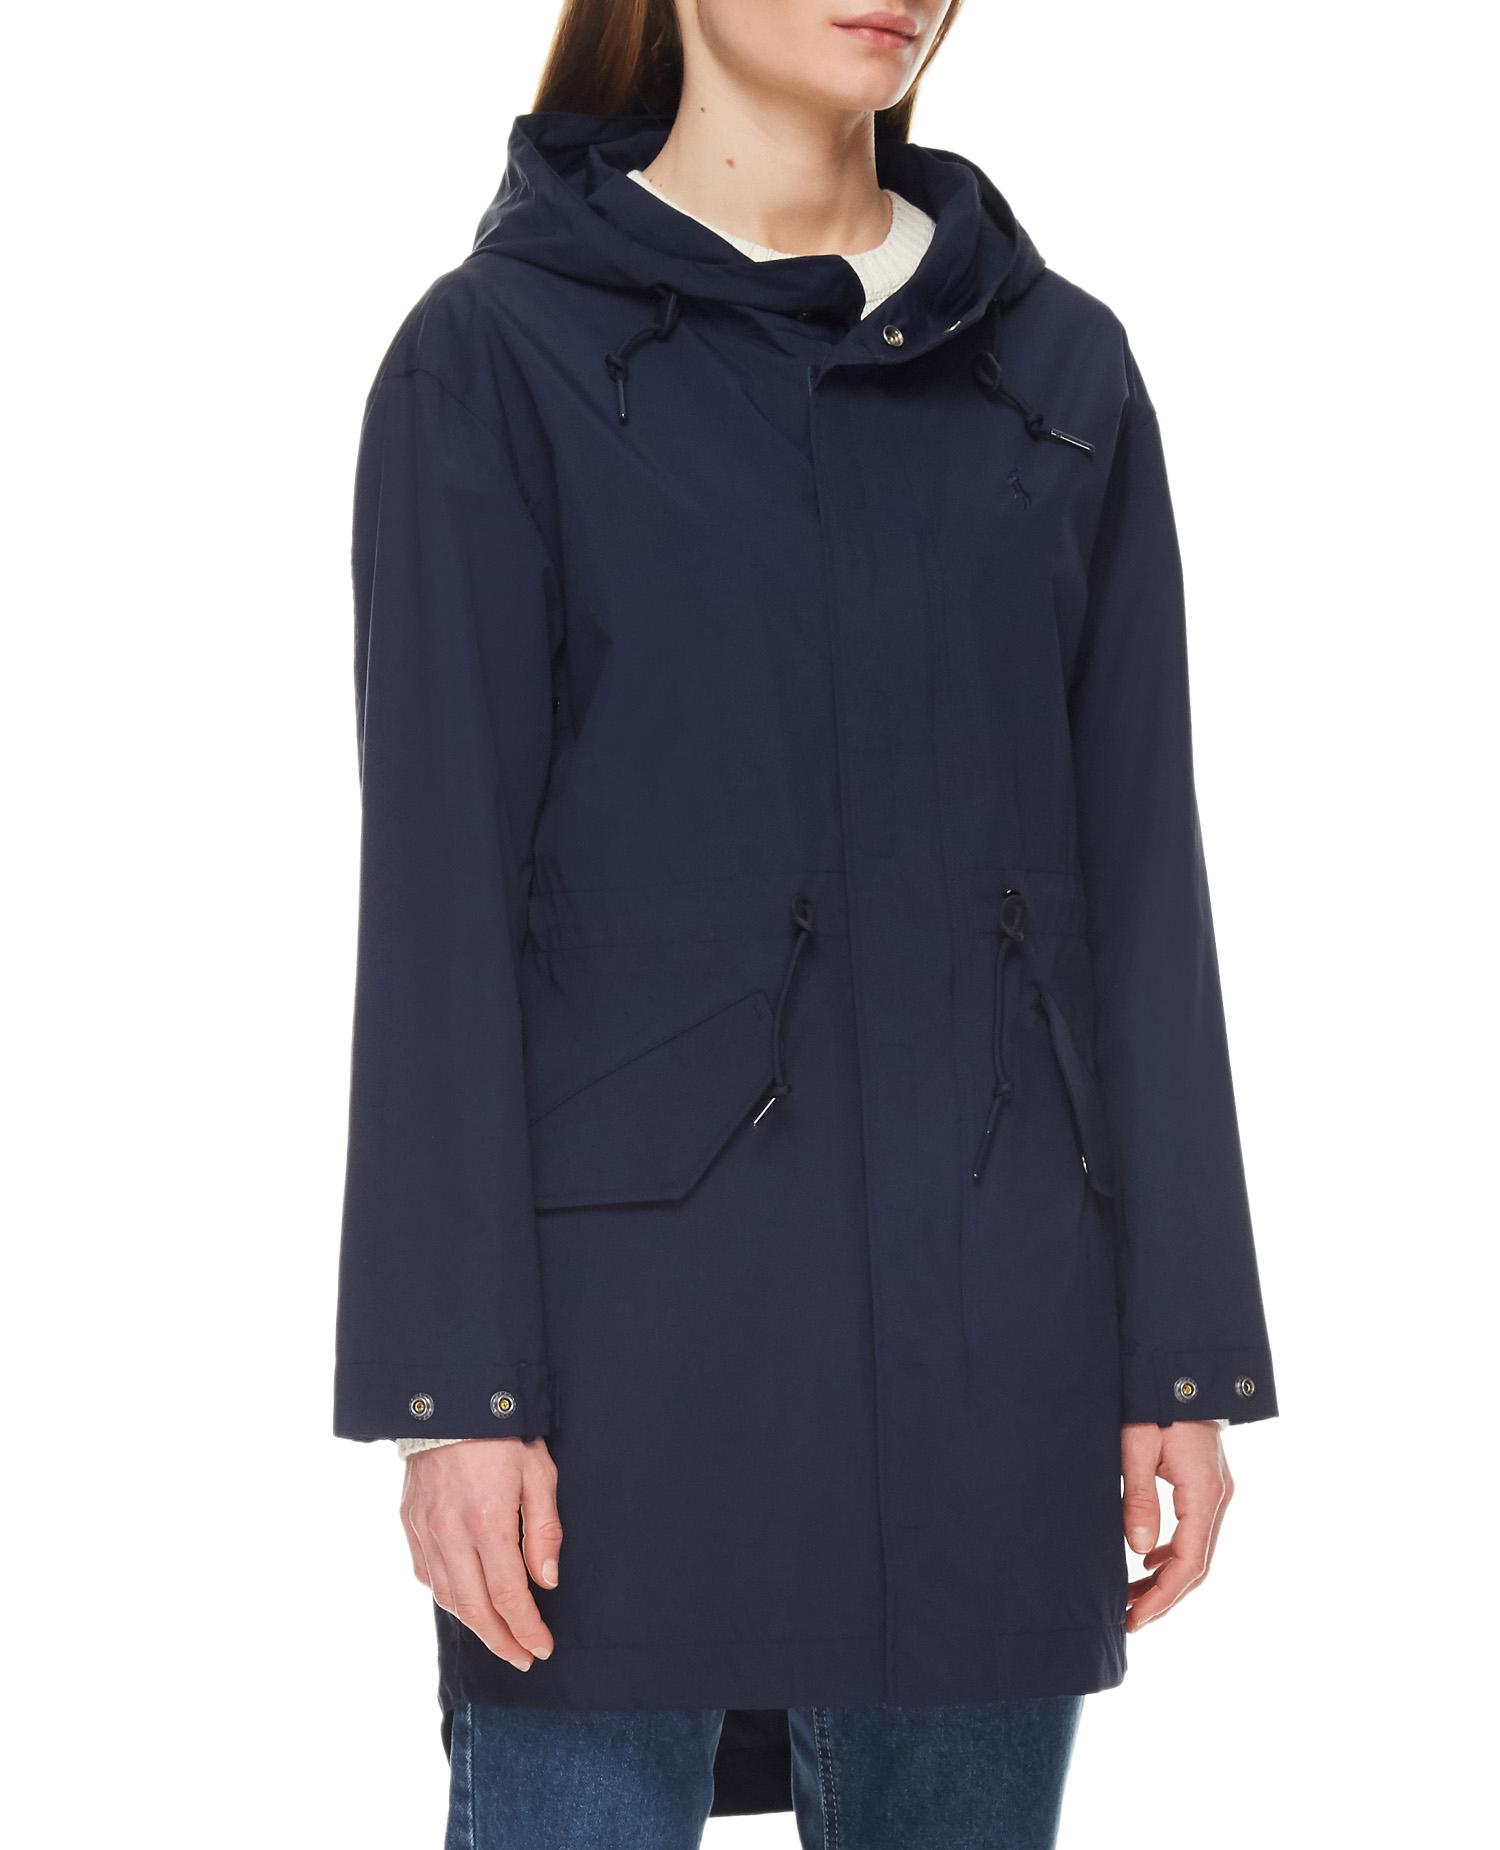 Женский темно-синий плащ Polo Ralph Lauren 211801137005 — MD-Fashion